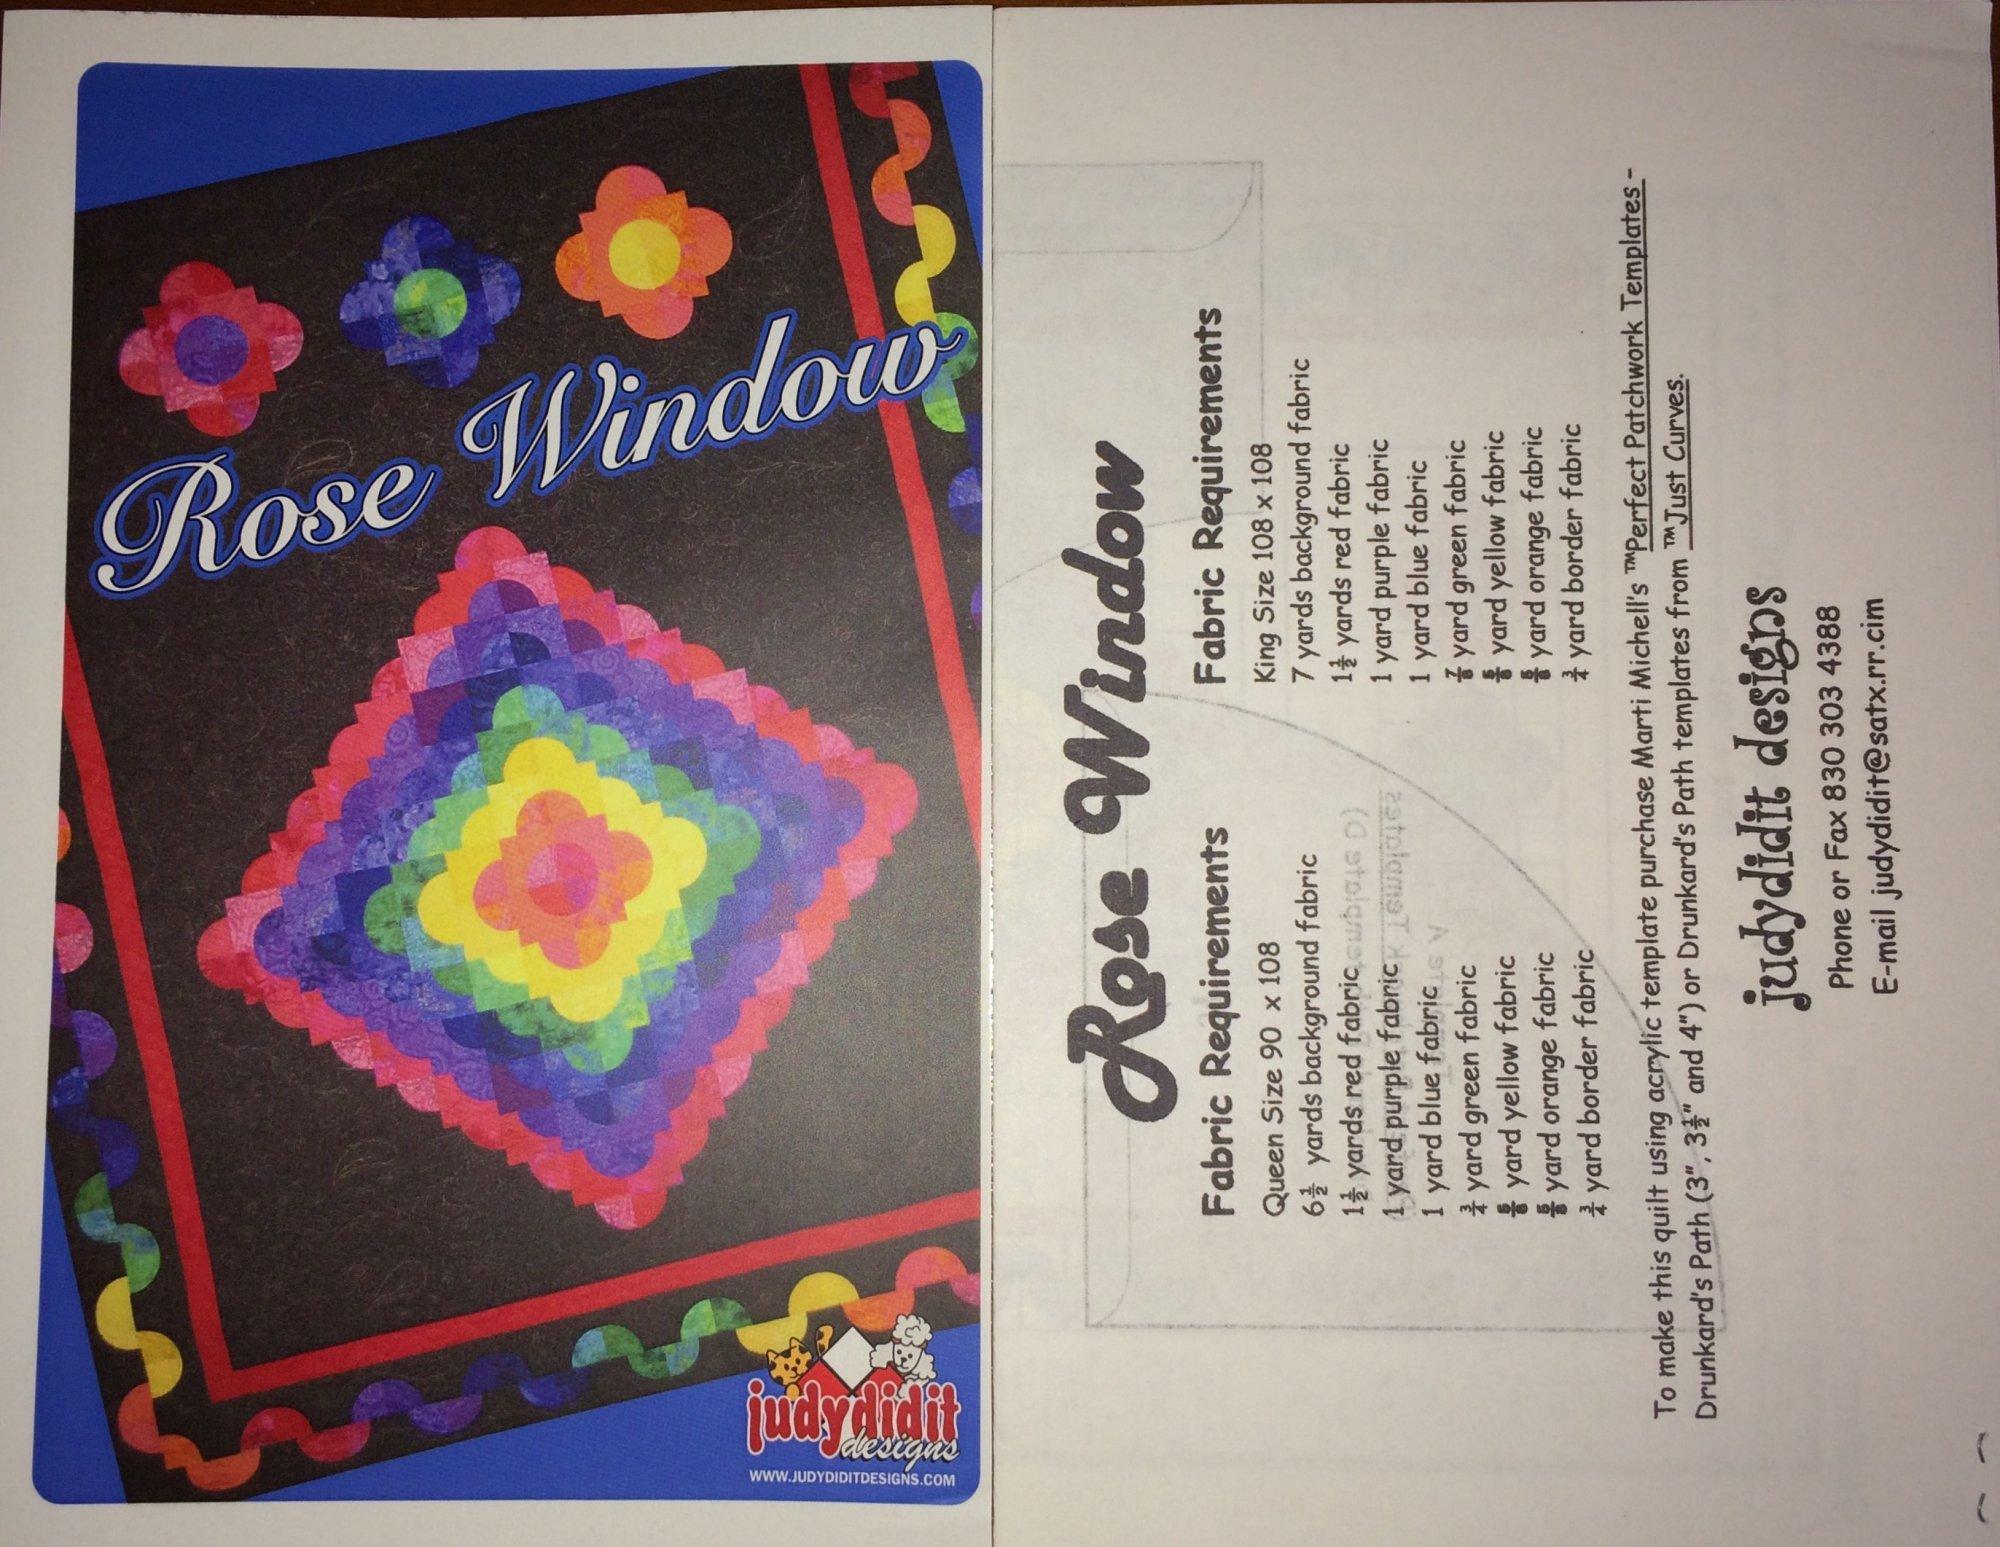 Rose Window by Judydidit Designs